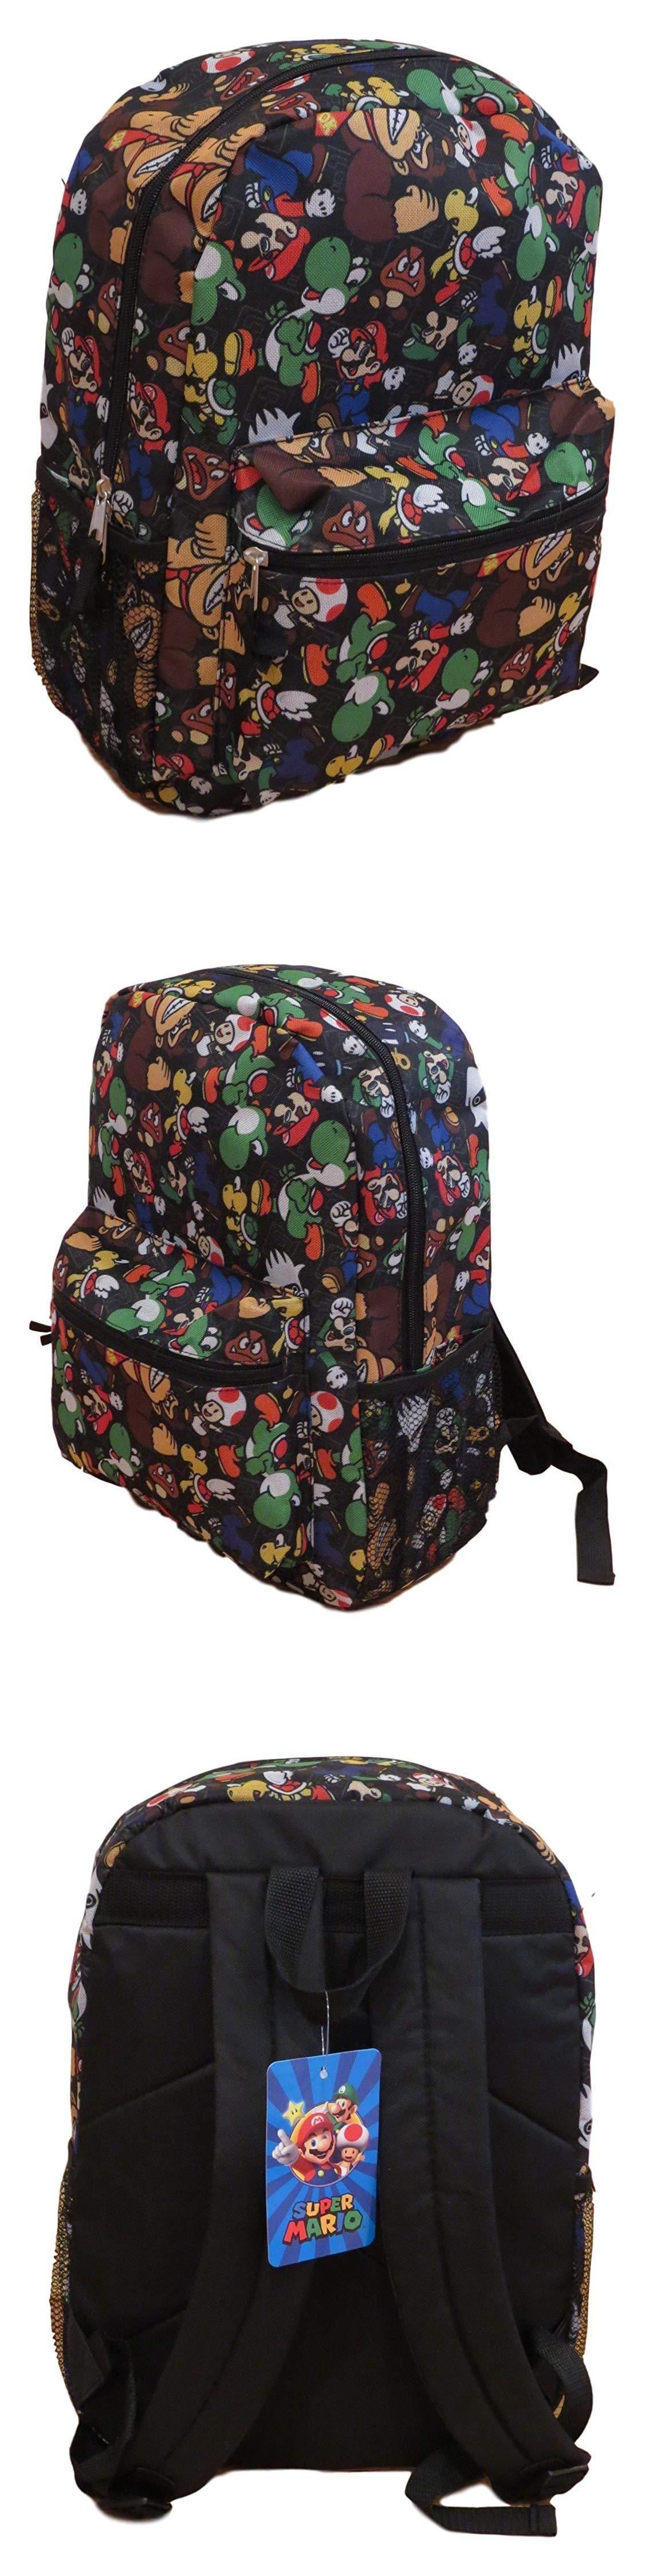 Backpacks and bags super mario school backpack book bag yoshi